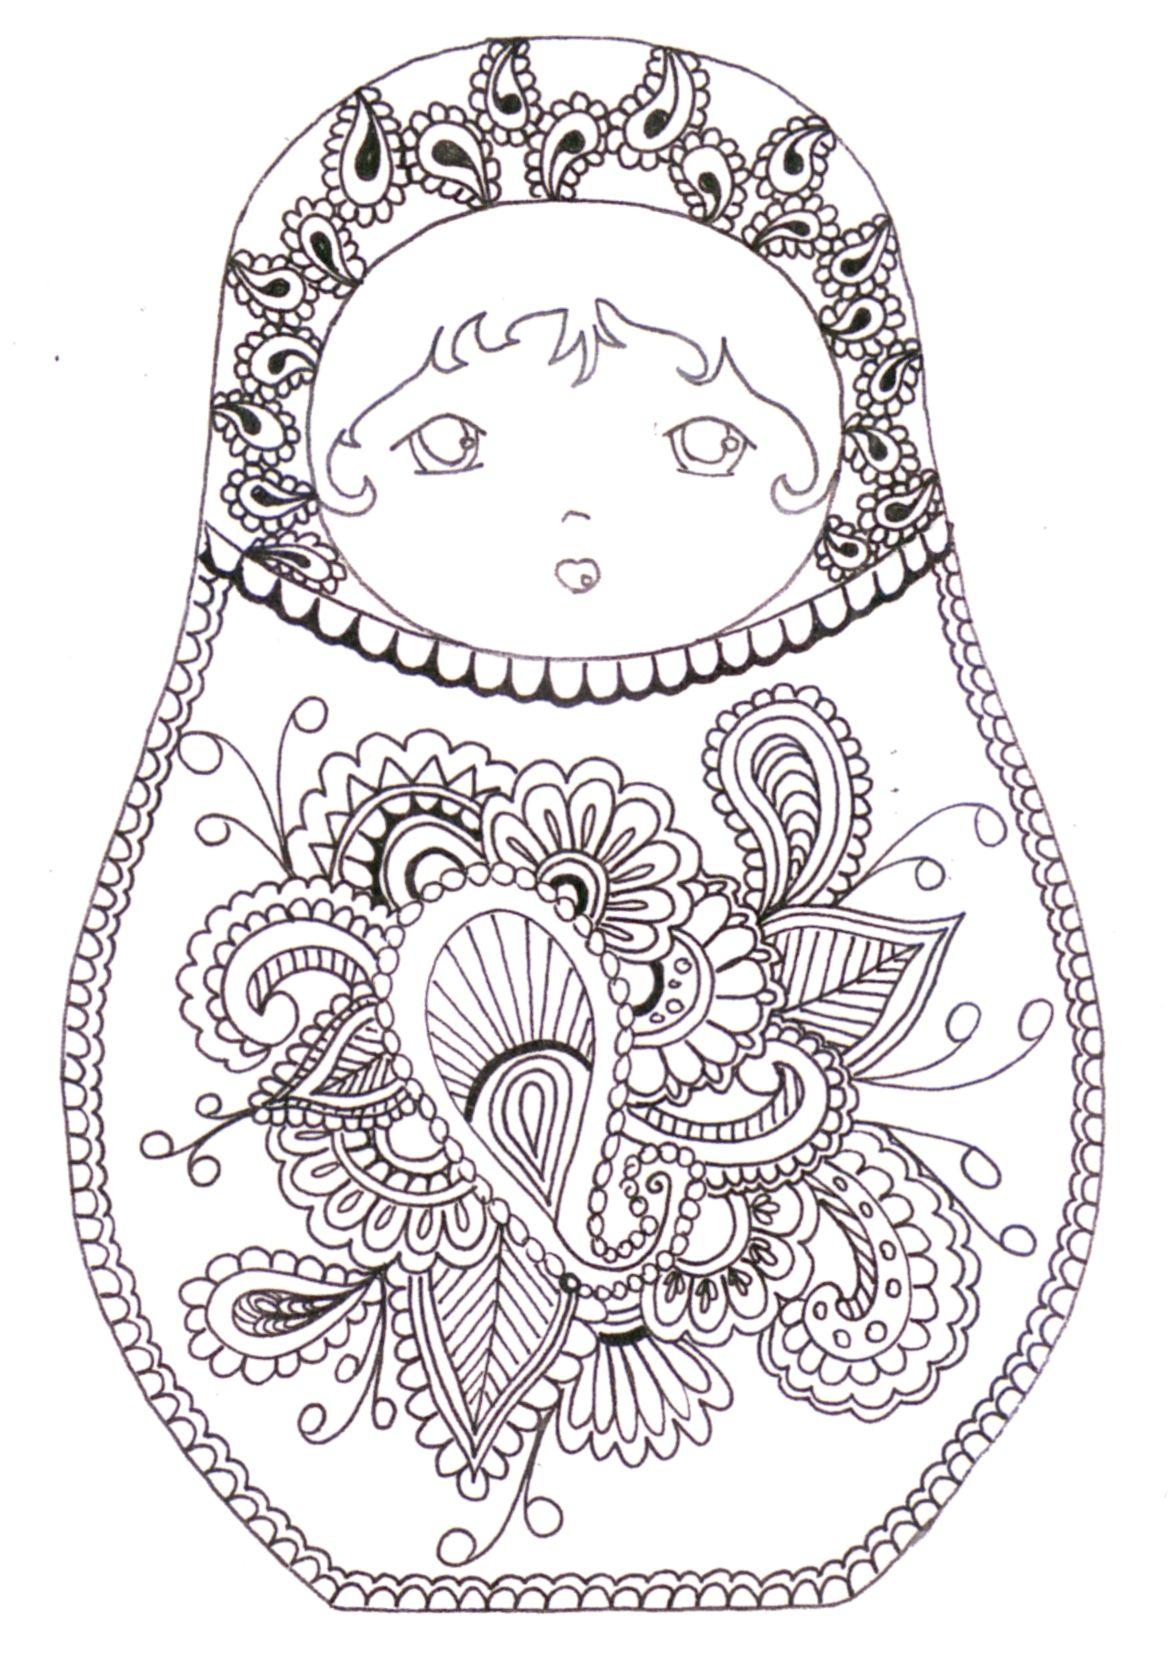 Matryoshka Coloriage Abstract Doodle Zentangle Paisley Coloring